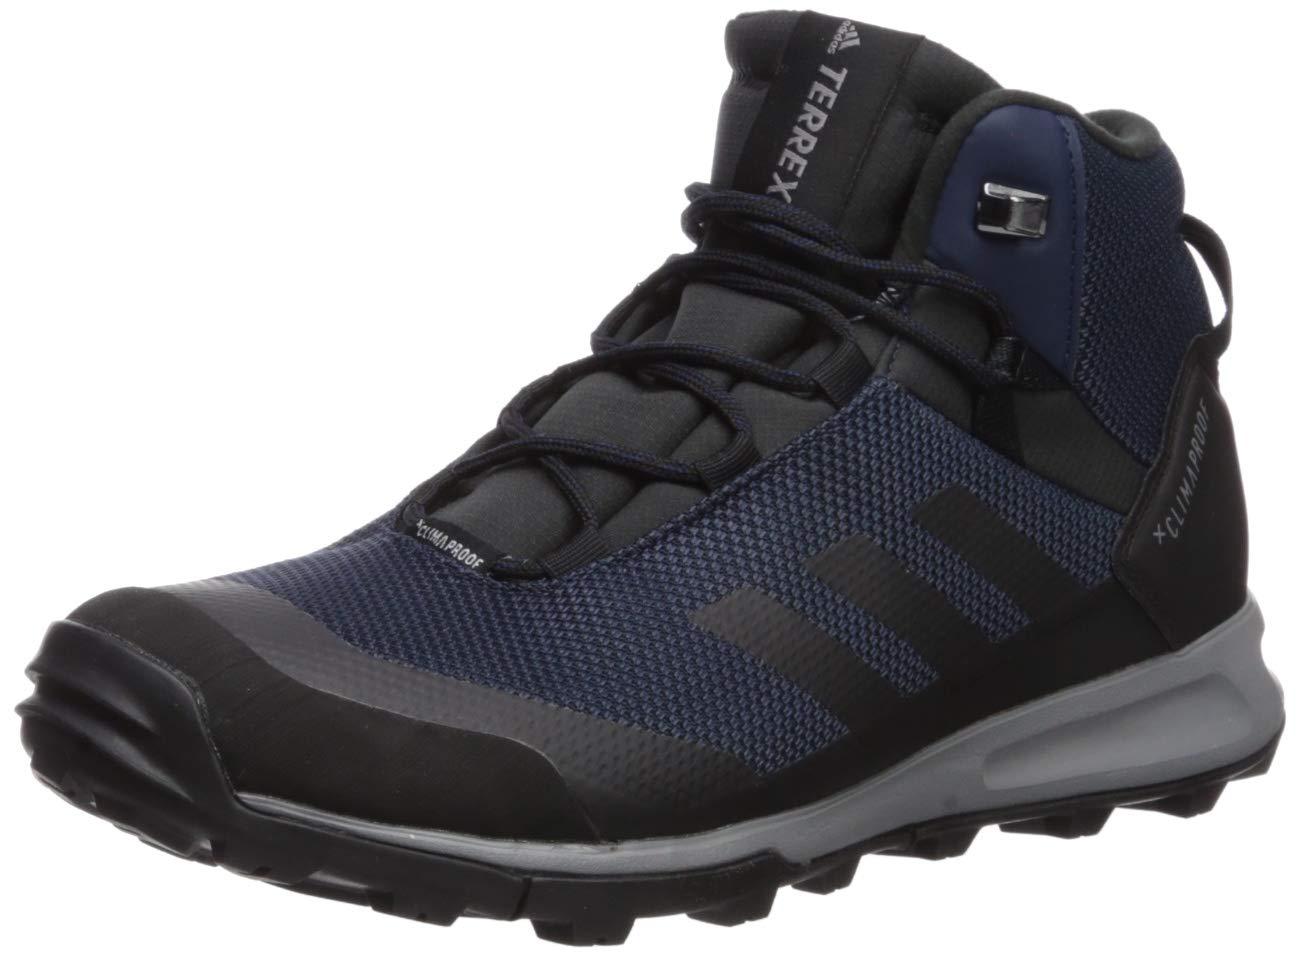 adidas outdoor Men's Terrex Tivid MID CP Boot, COL Navy/Black/Grey Three, 12.5 D US by adidas outdoor